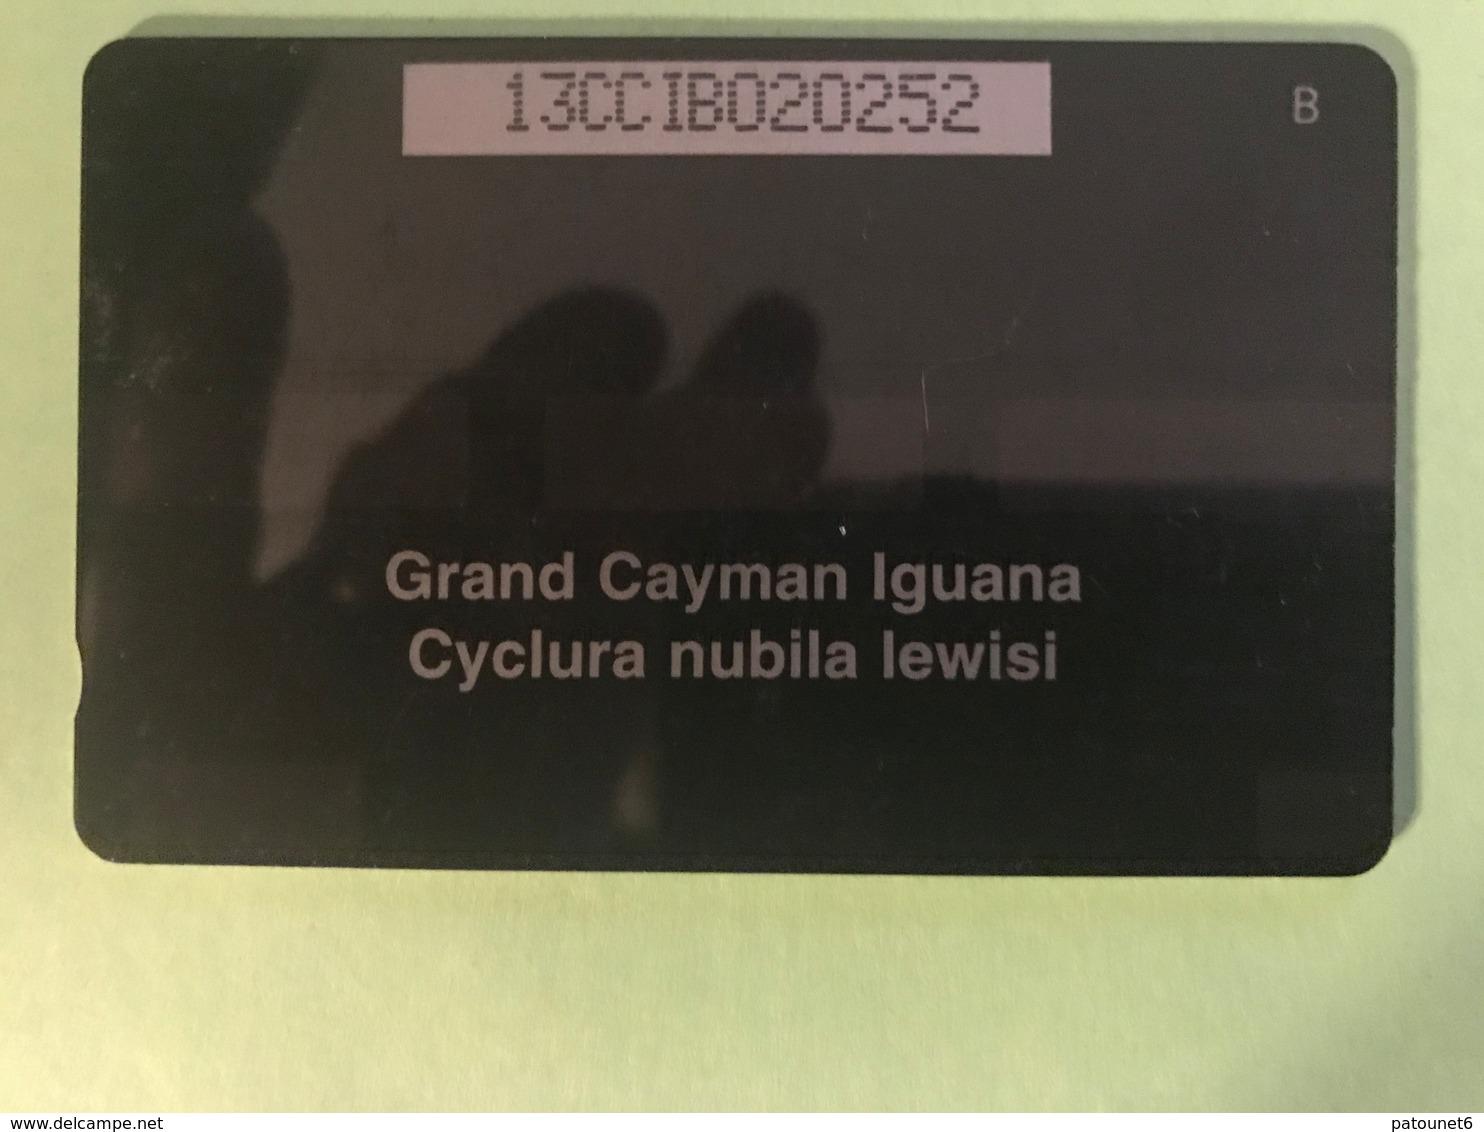 ILES CAYMAN  -  Phonecard  -  Cabble & Wirelees  -  Grand Cayman Iguana  -  CI $ 10 - Iles Cayman